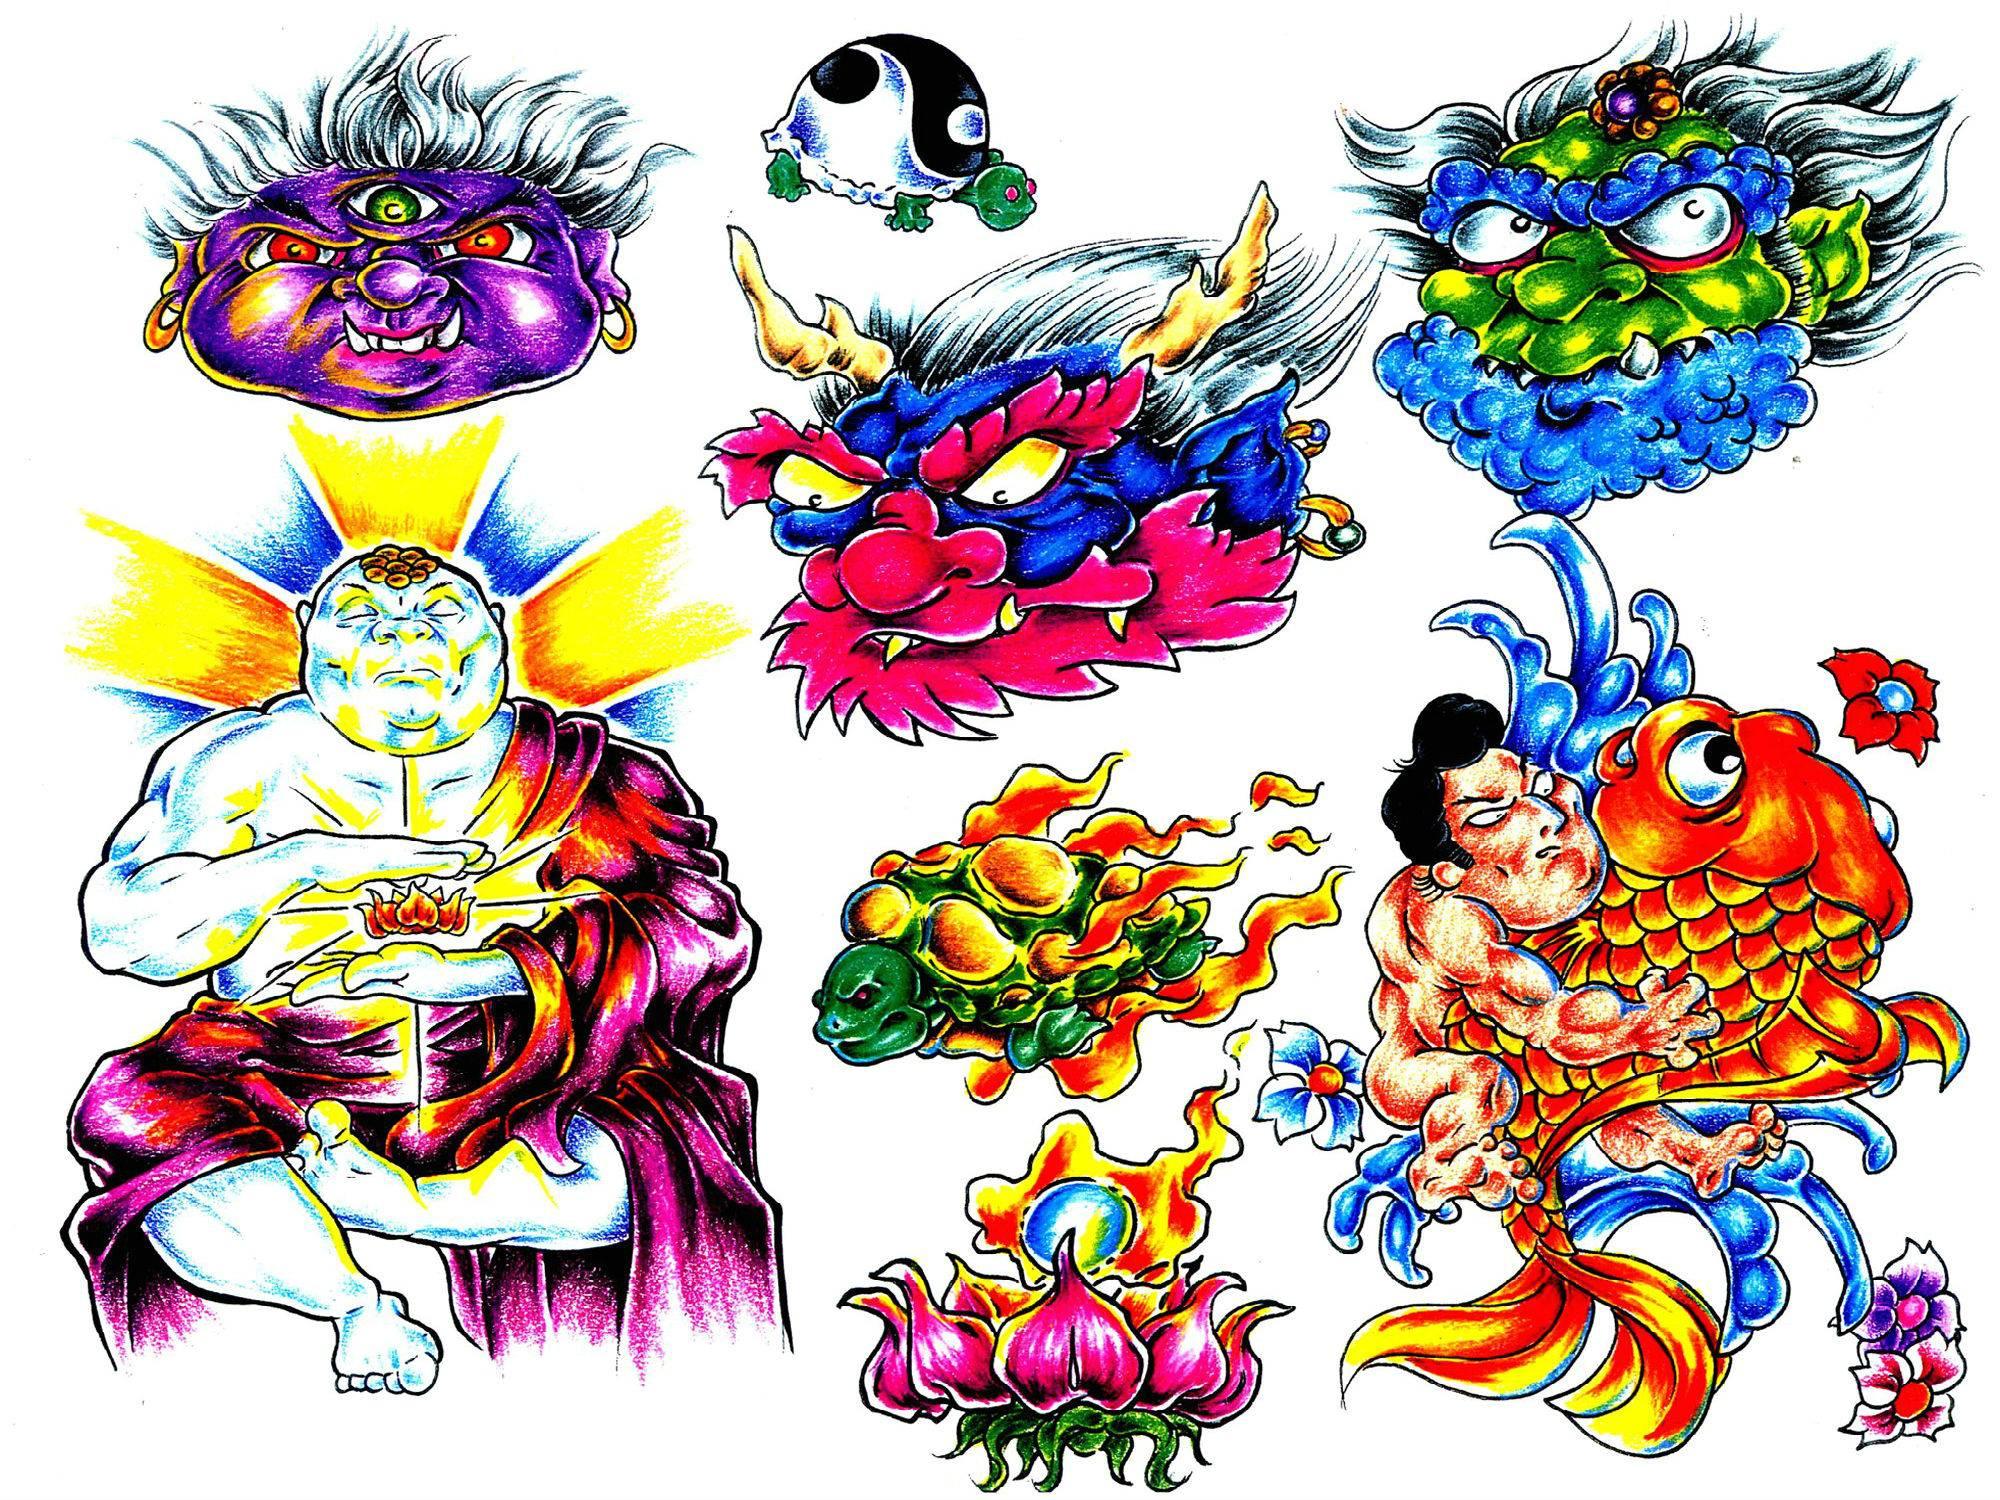 Tattoo Computer Wallpapers Desktop Backgrounds 2000x1500 Id 301871